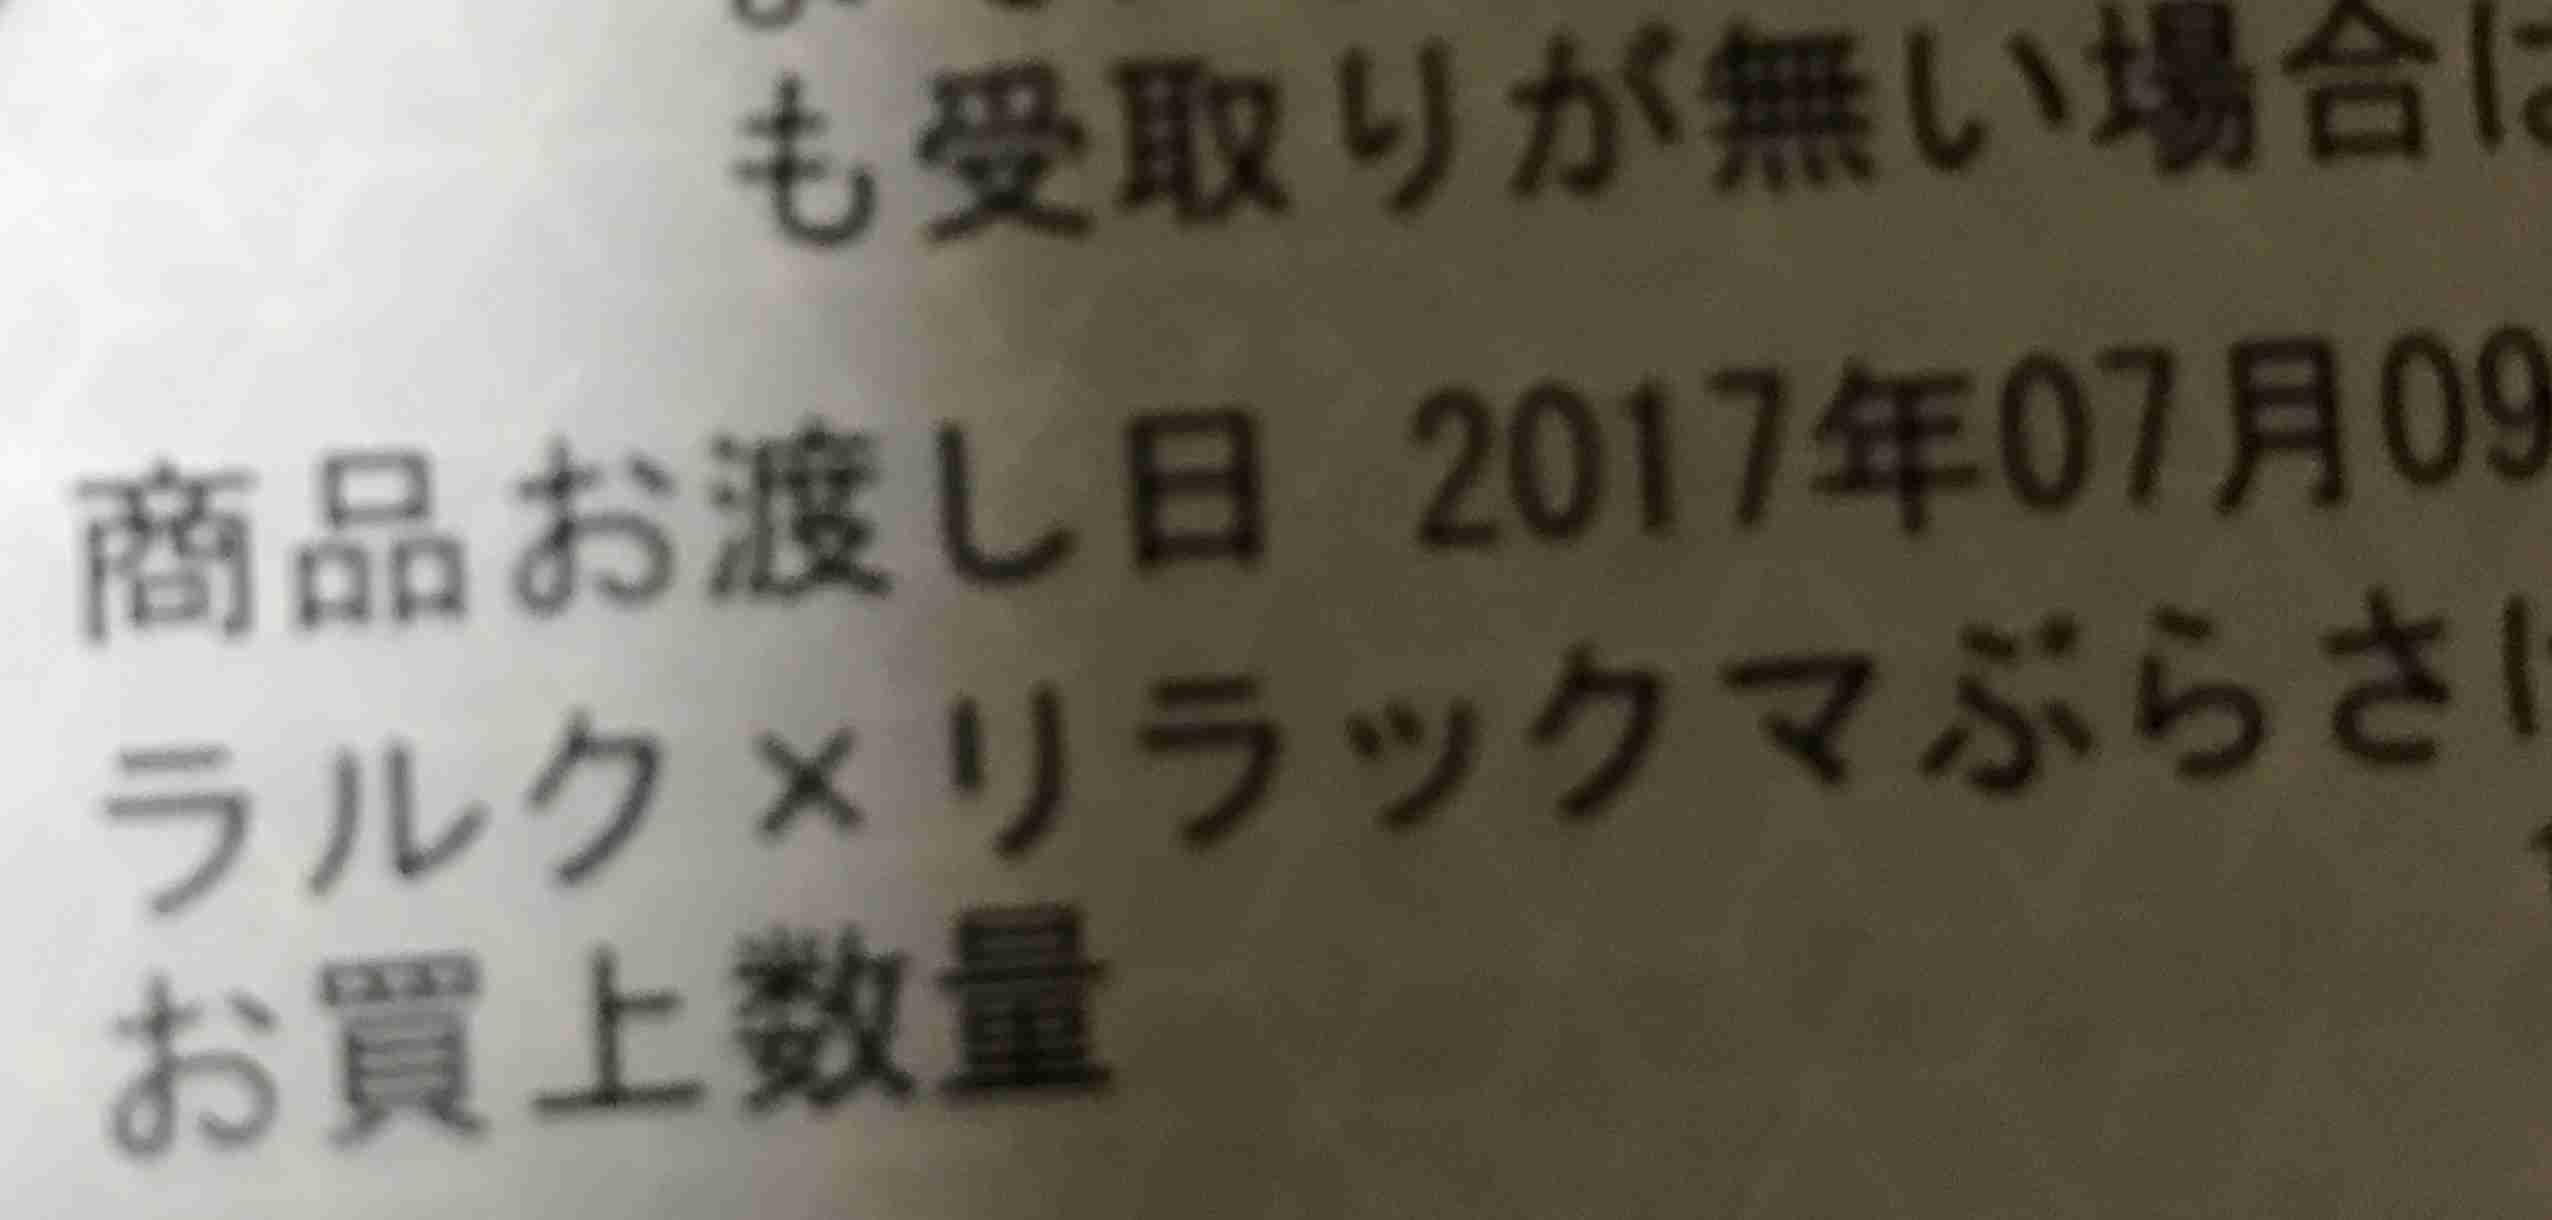 L'Arc~en~Cielとリラックマがコラボした「L'Arkkuma」誕生